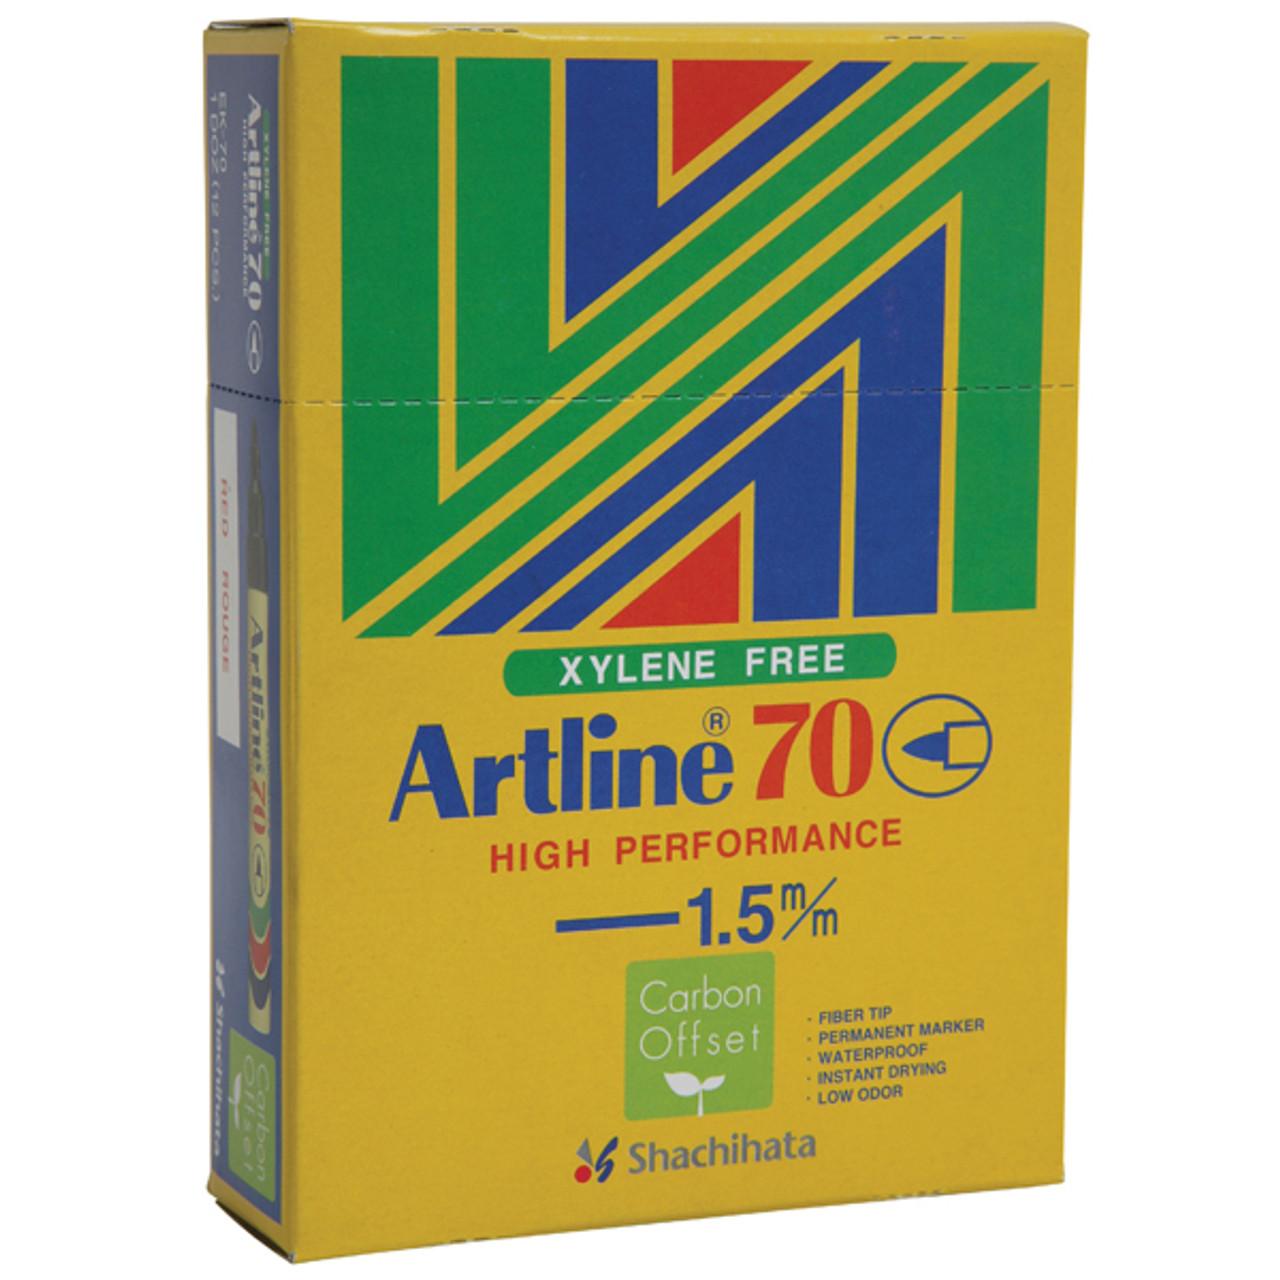 Artline Permanent Marker 70 Bullet Nib Multiple Colors